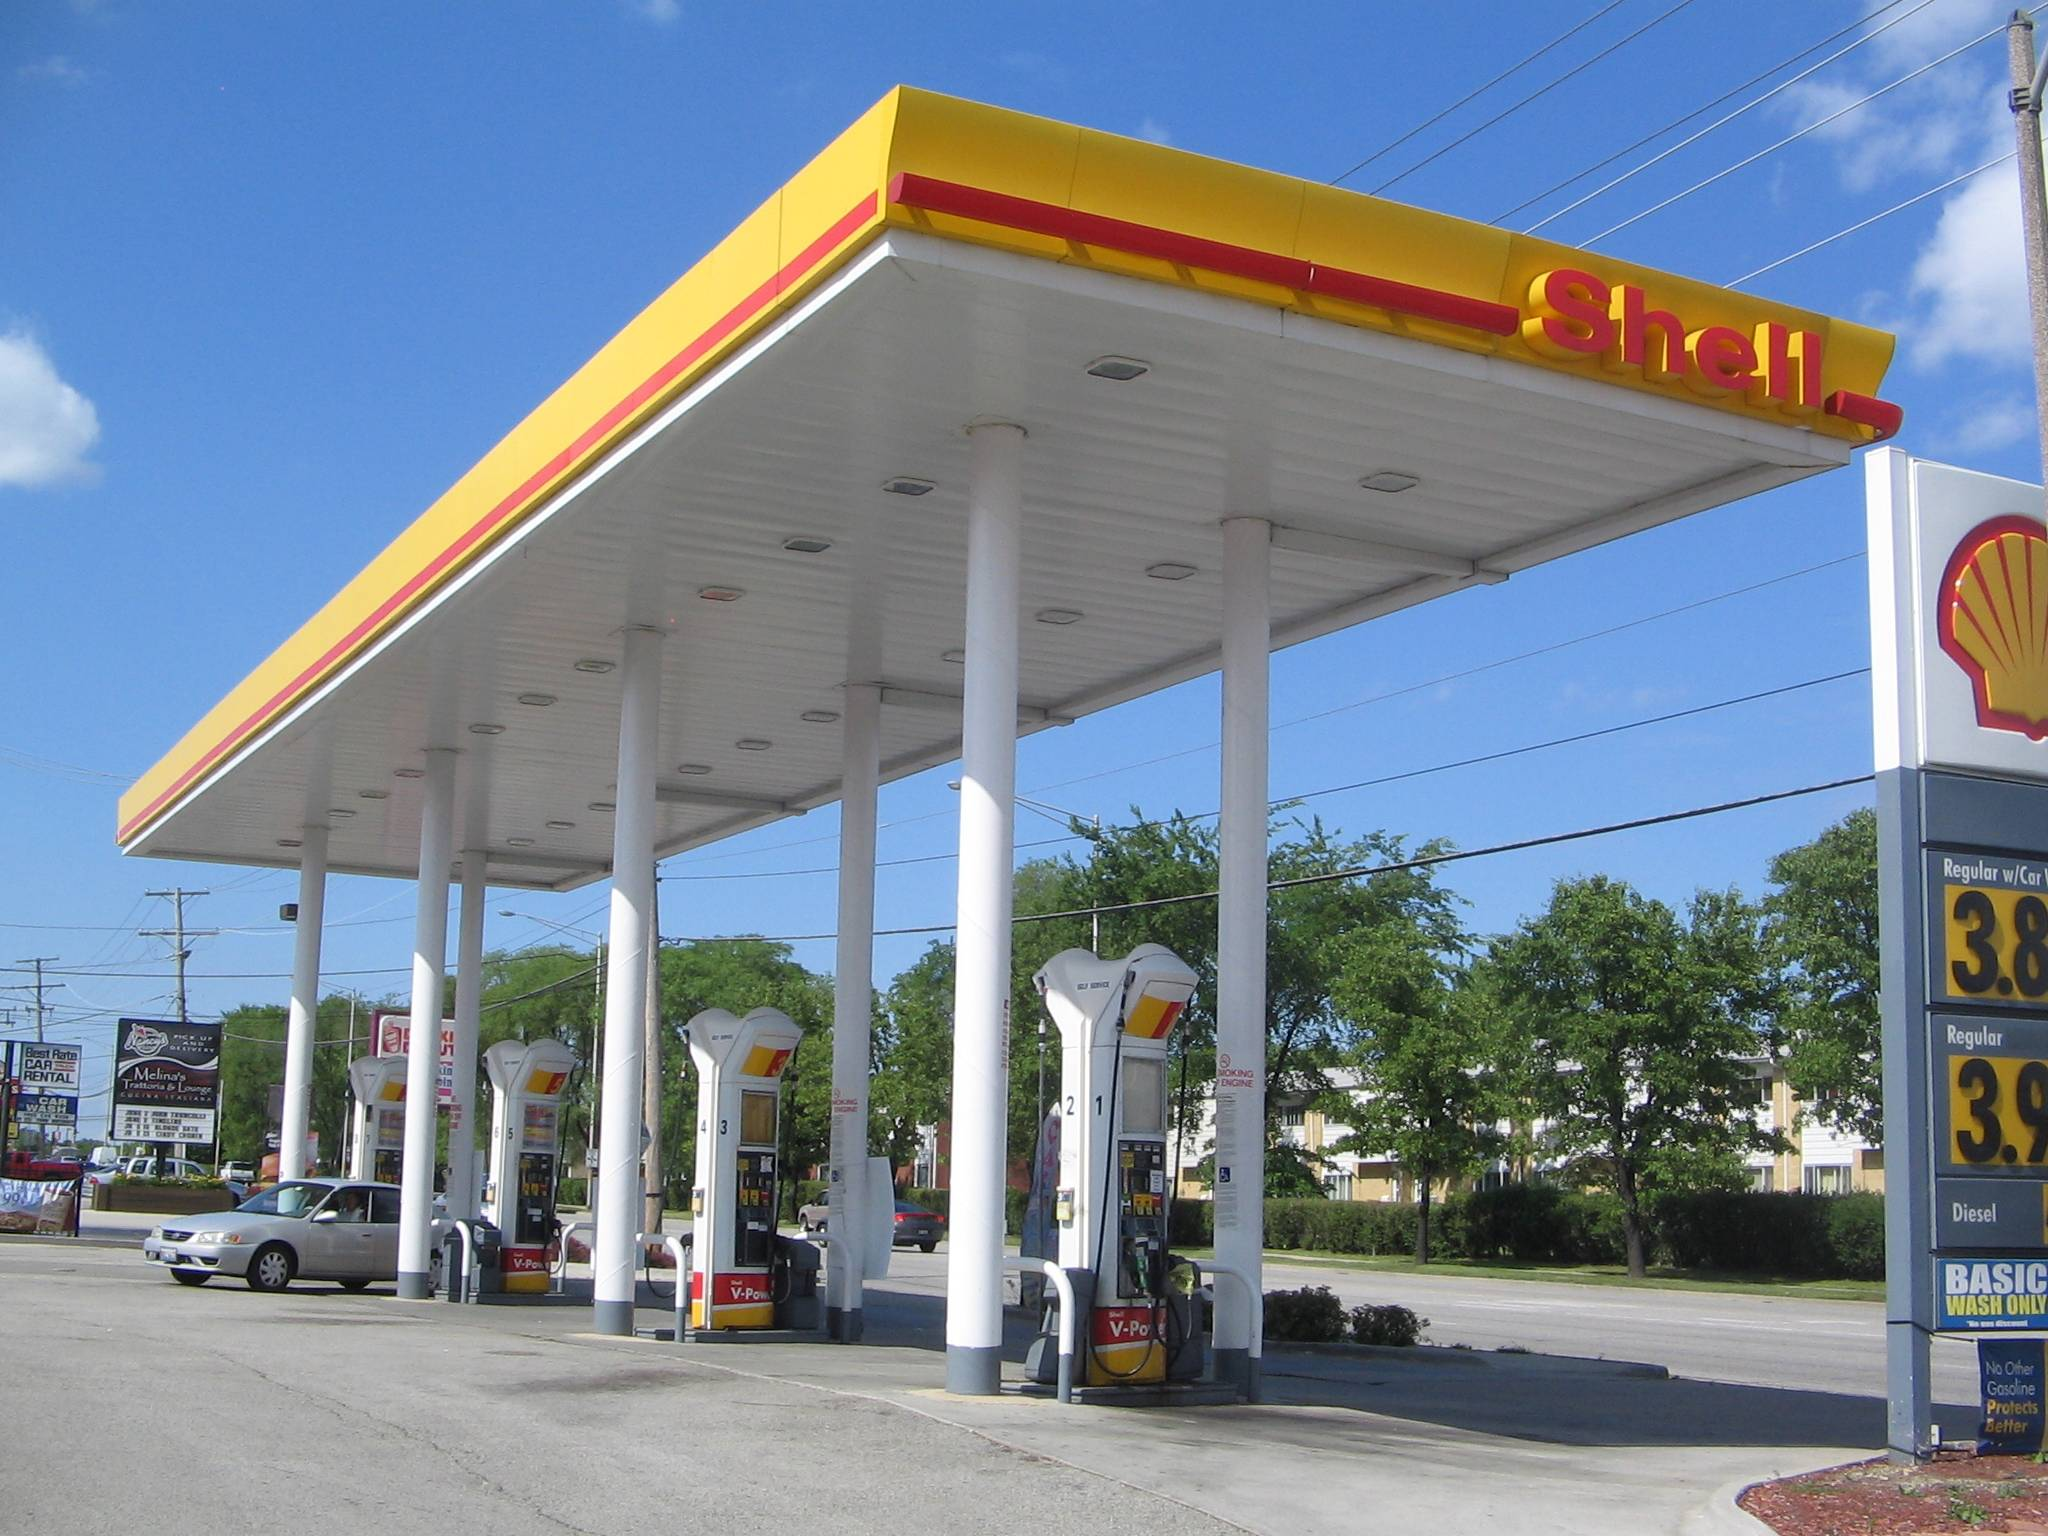 York Shell Gas Station, Elmhurst